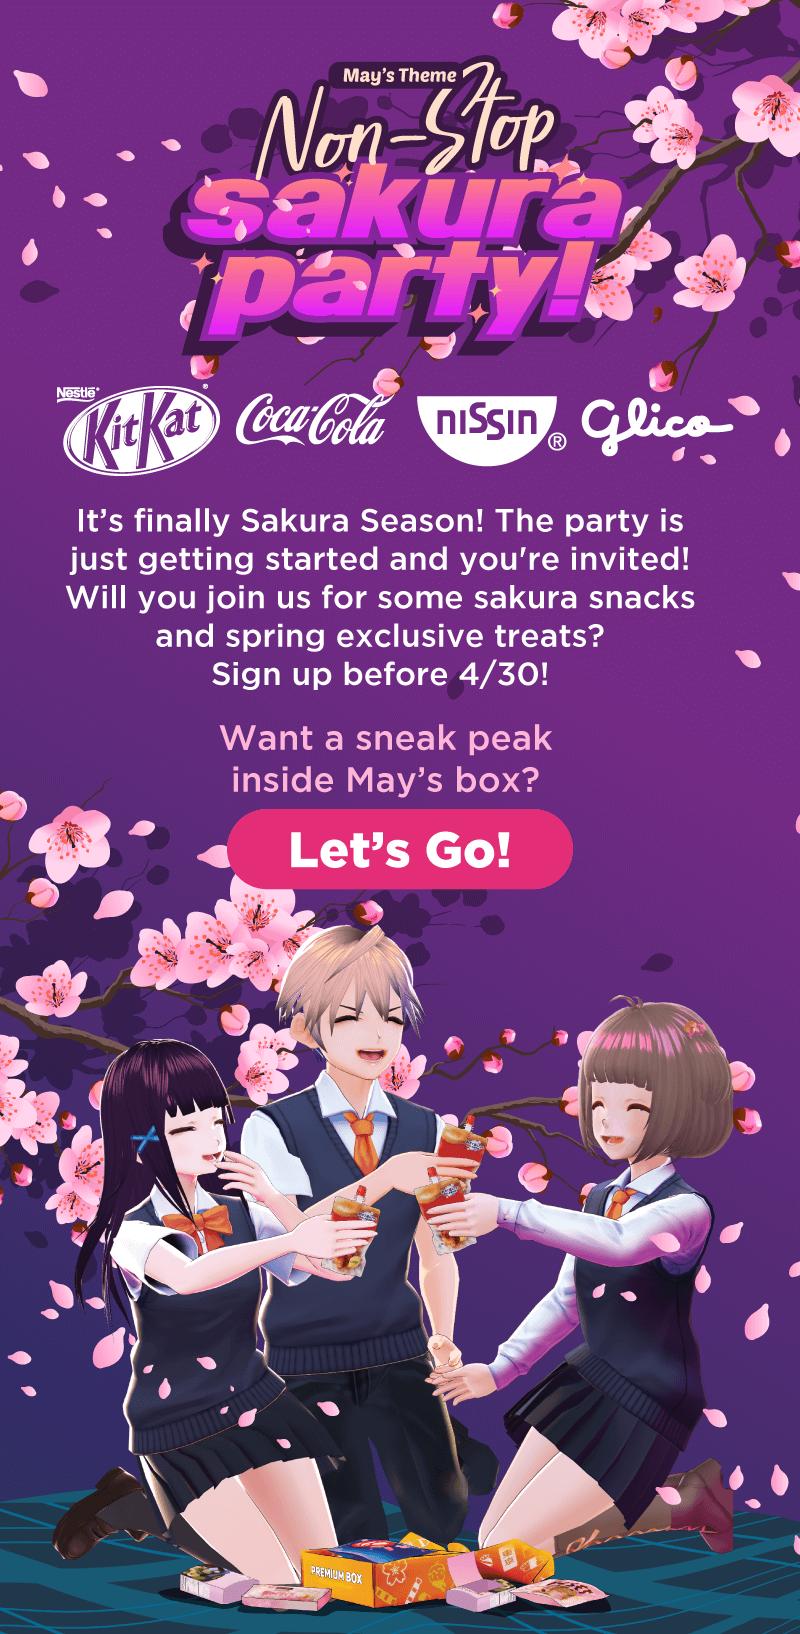 TokyoTreat May 2020 Theme Spoiler + Coupon Code